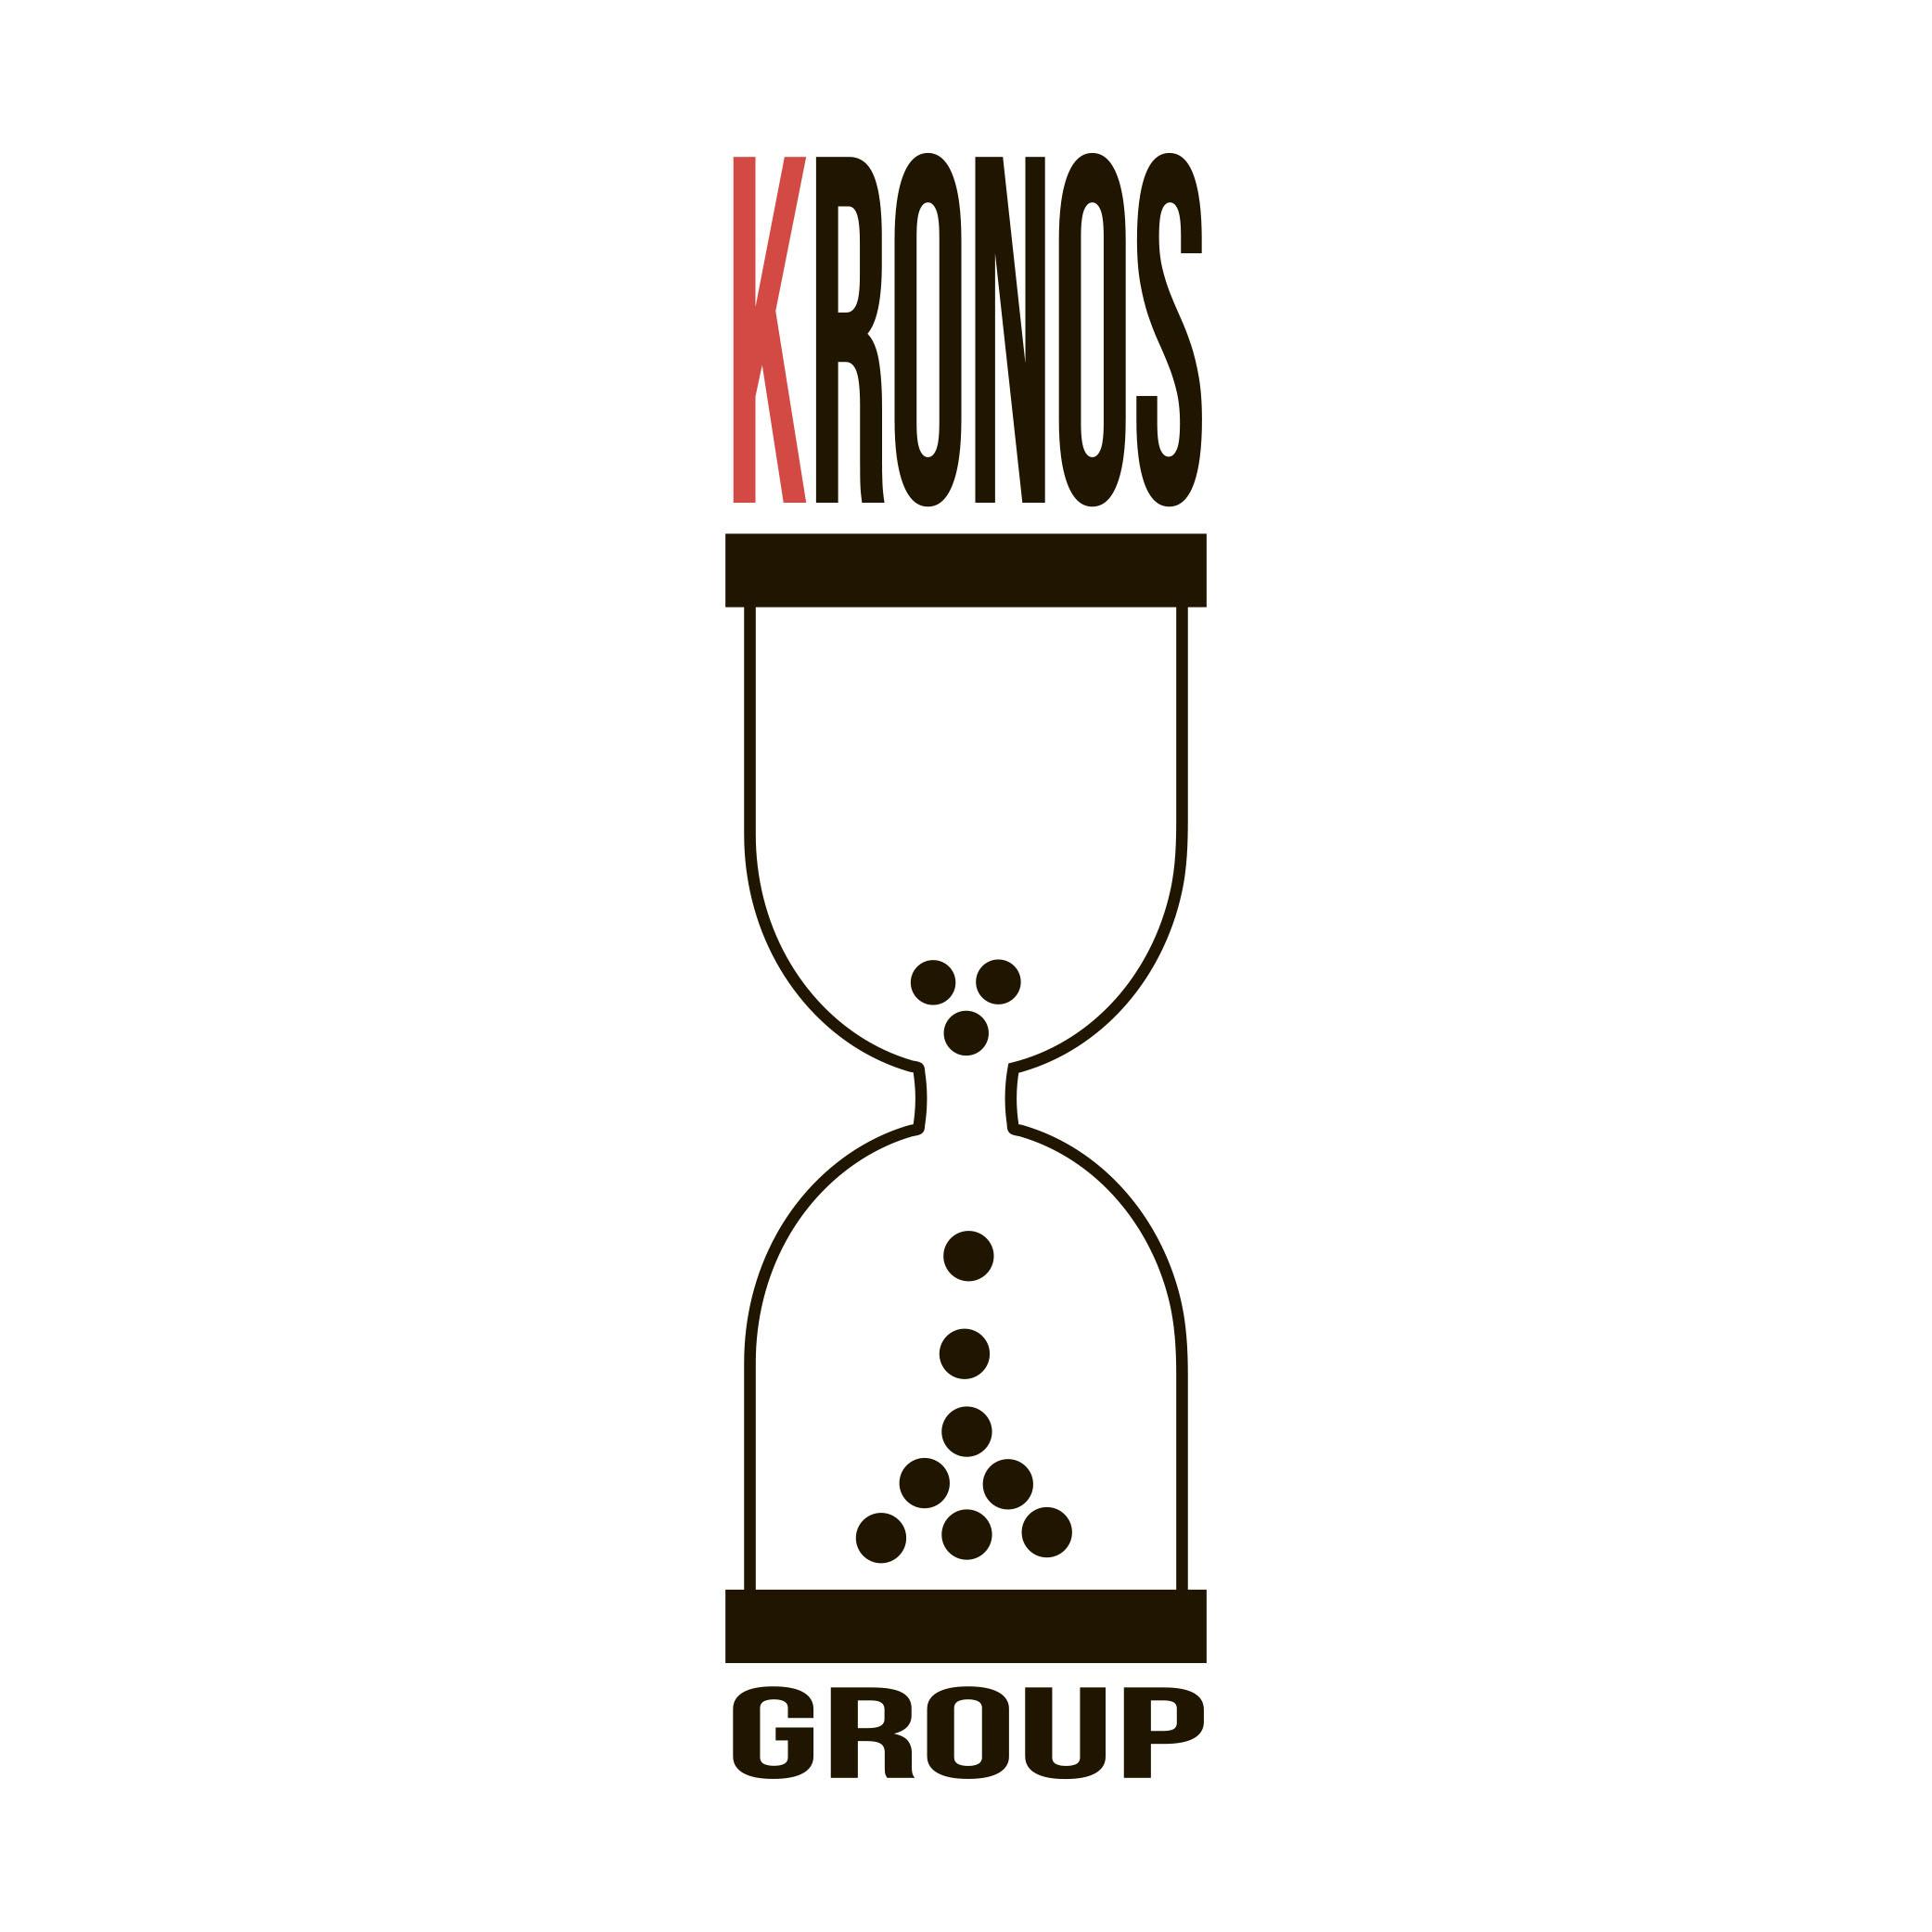 Разработать логотип KRONOS фото f_2455fb23c32d346f.jpg